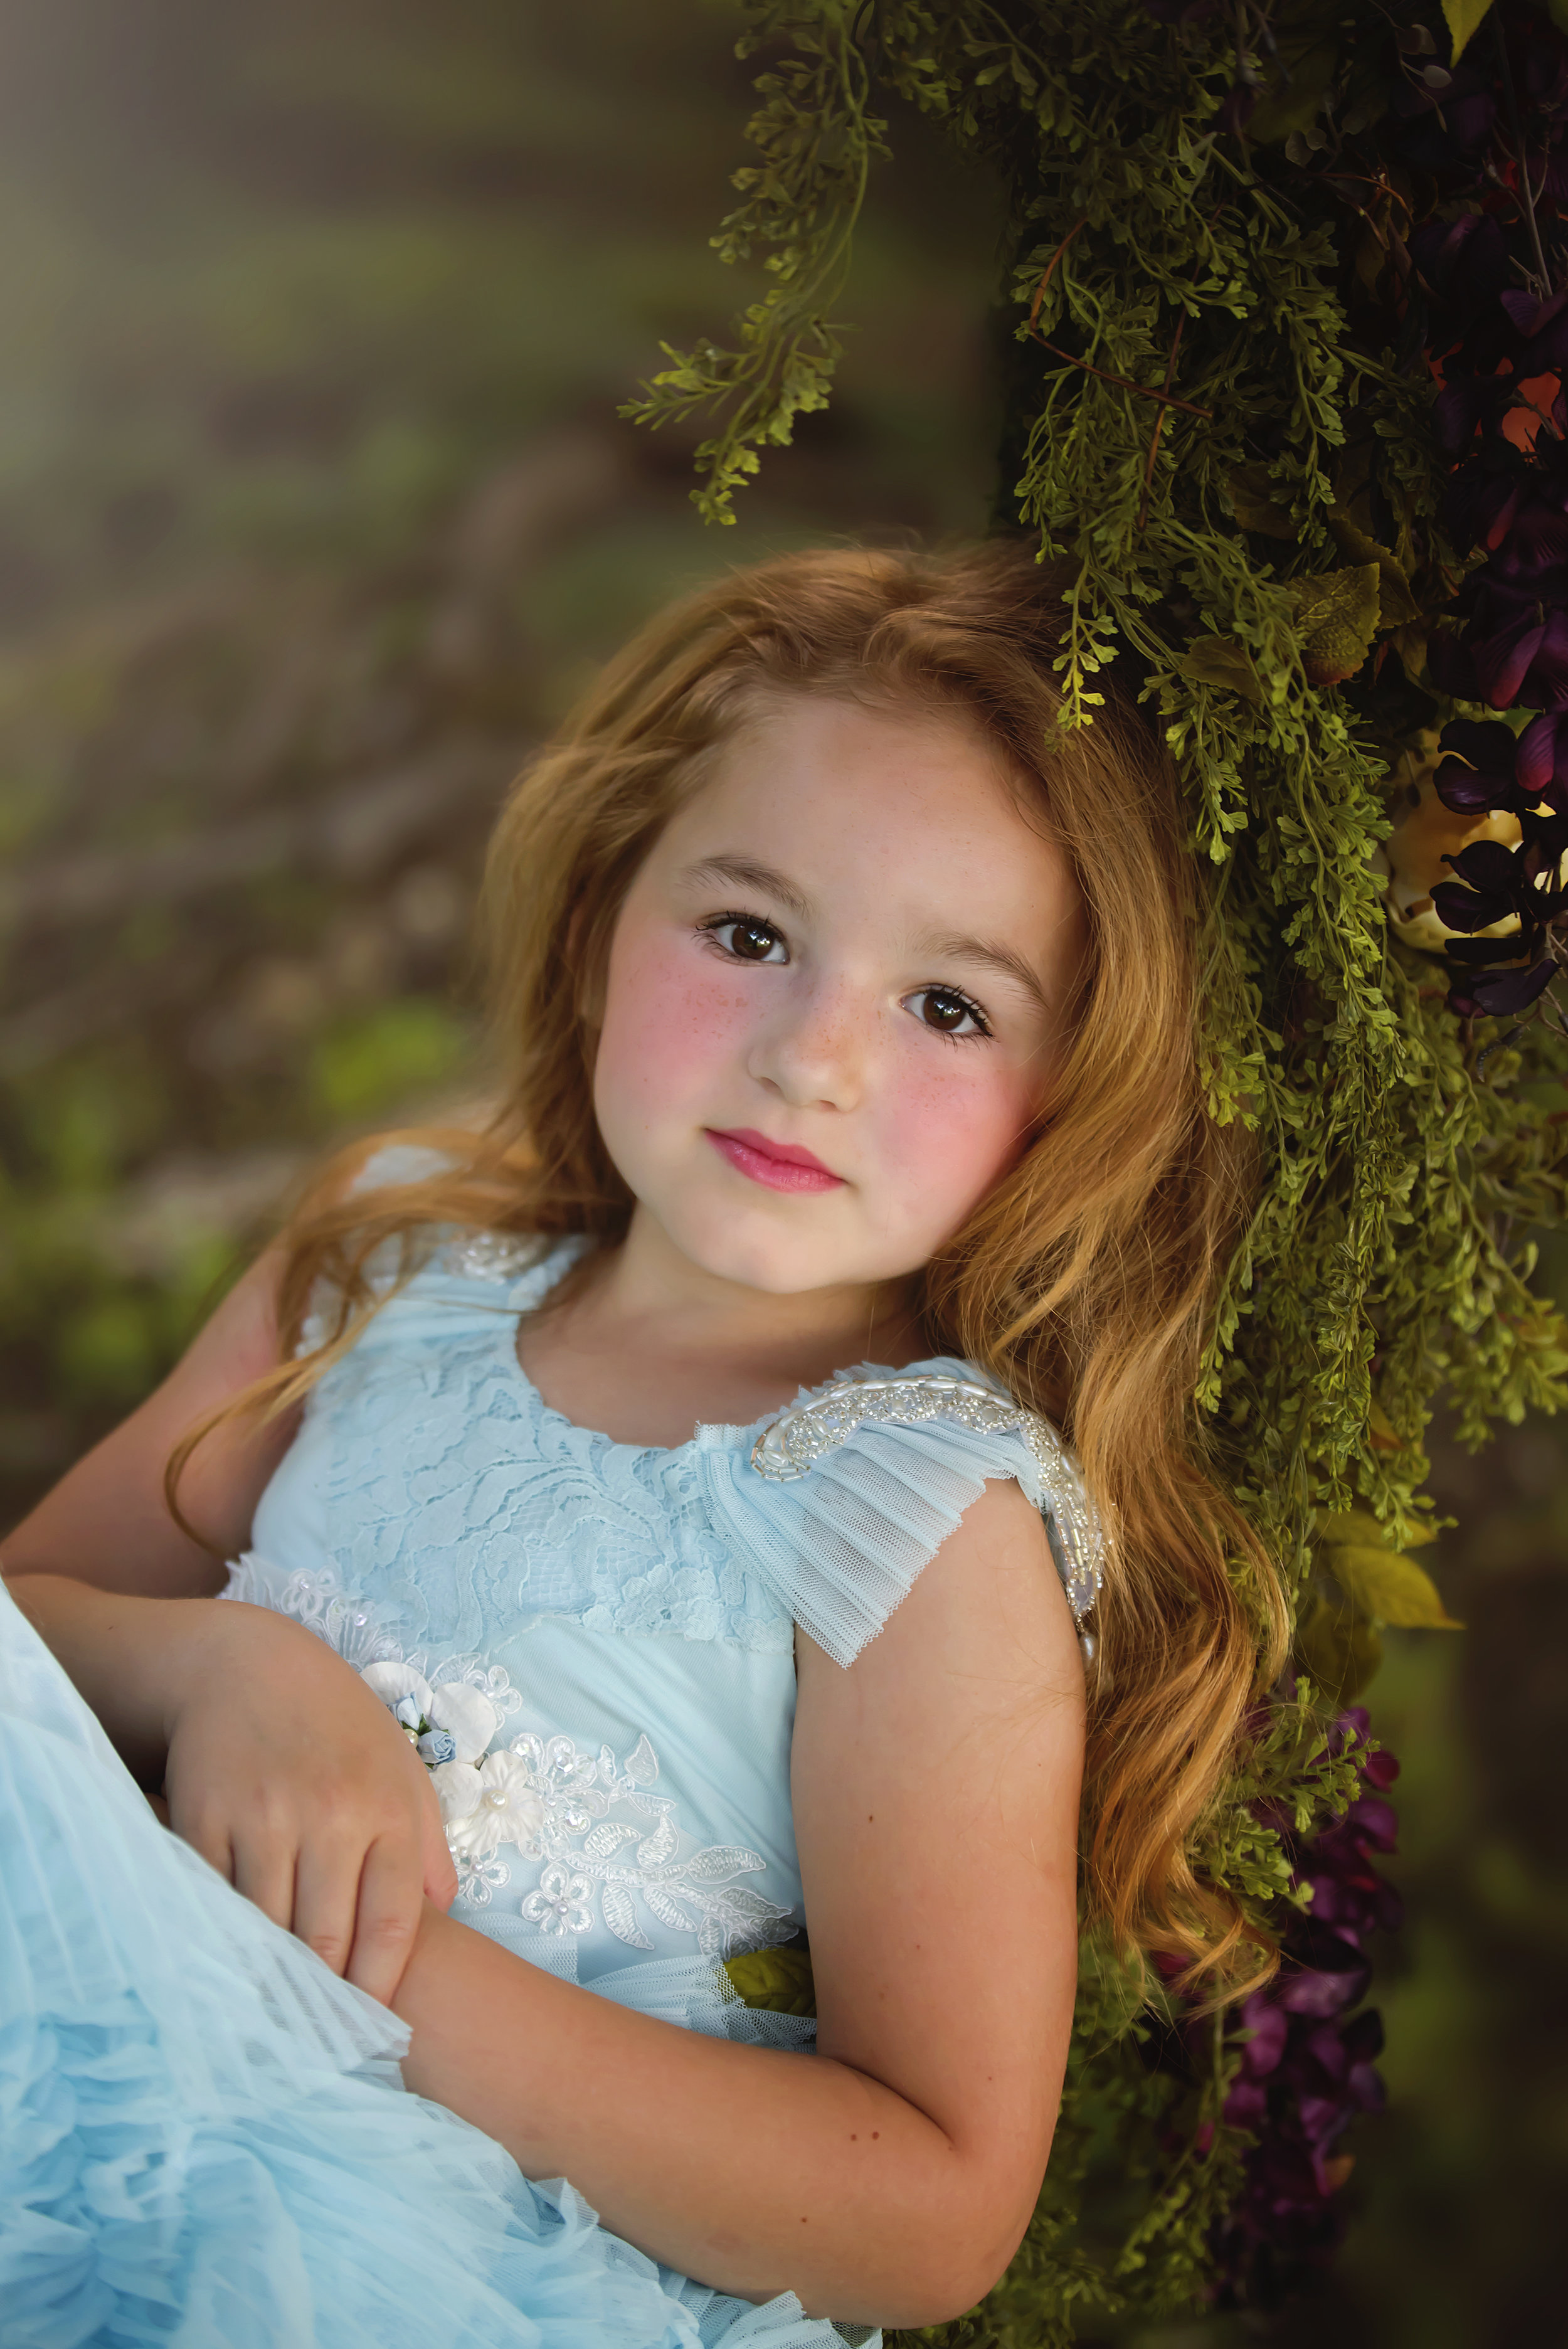 Reina-LeGrand-Photography-Photographer-Family-DFW-Dallas-Fort-Worth-Denton-Southlake-Colleyville-Grapevine-Roanoke-Keller-Westlake-Portrait-Portraiture-Photo-Session-Maren2.jpg